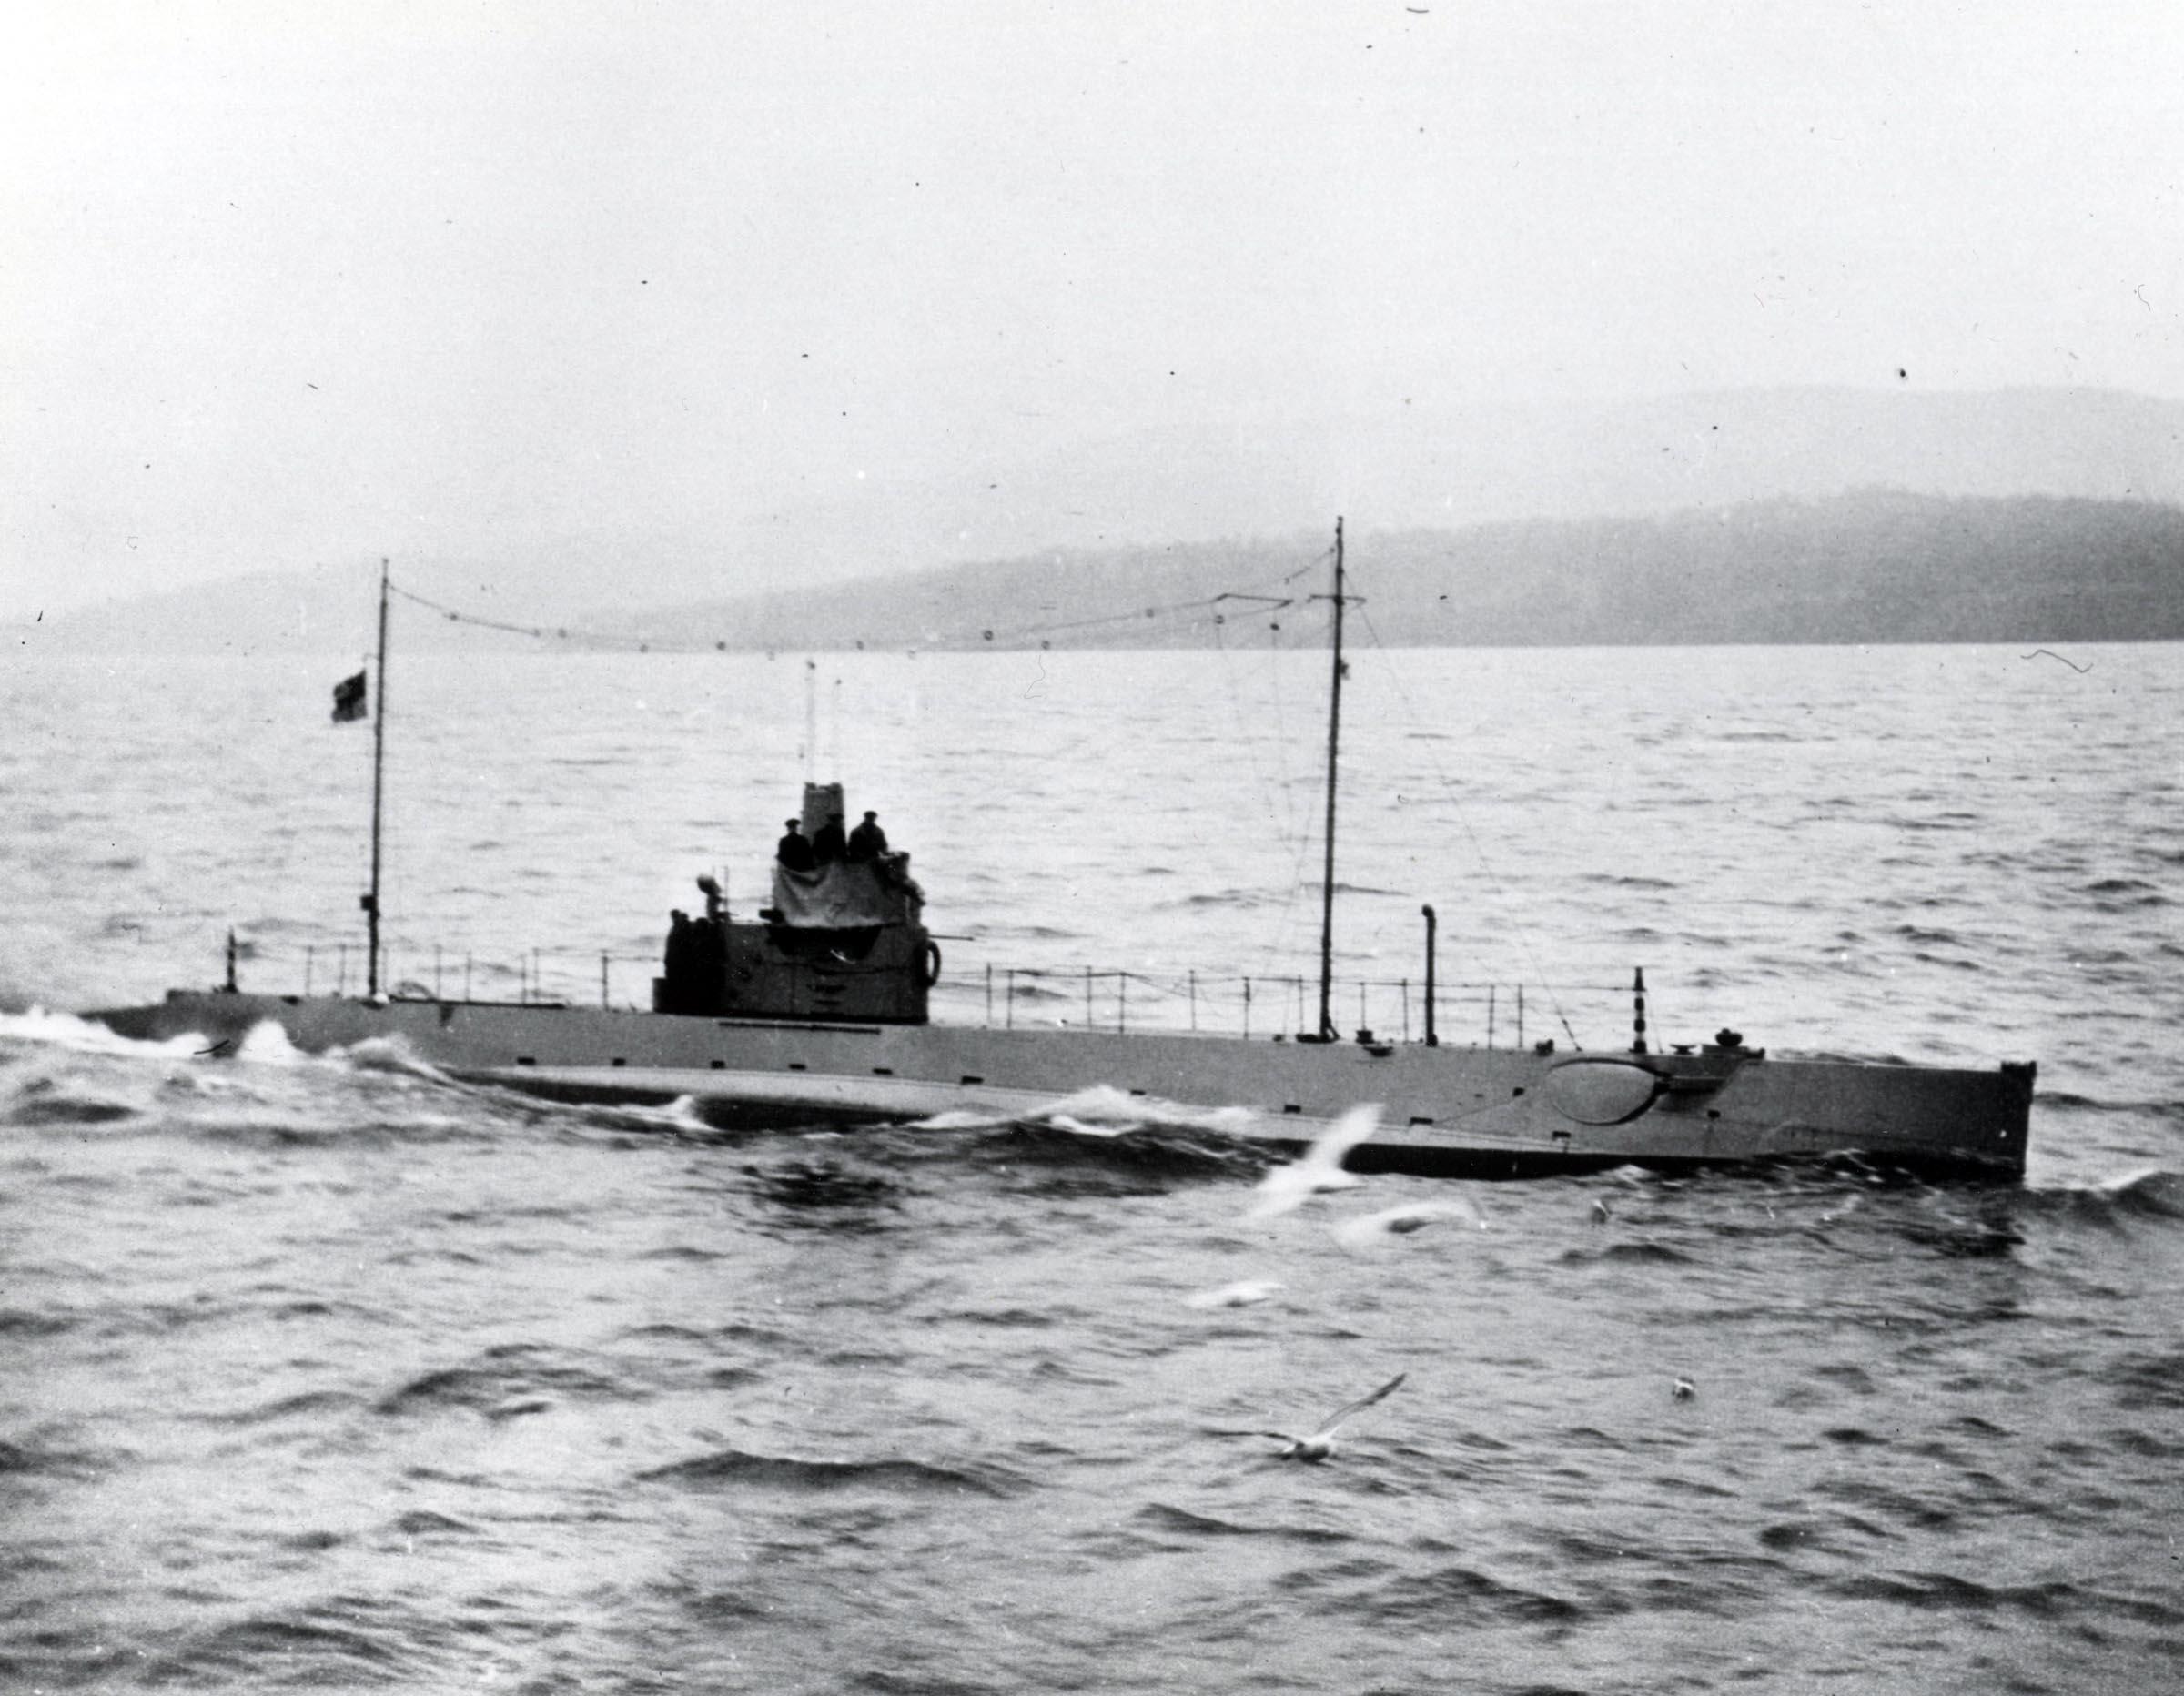 HMCS CC1